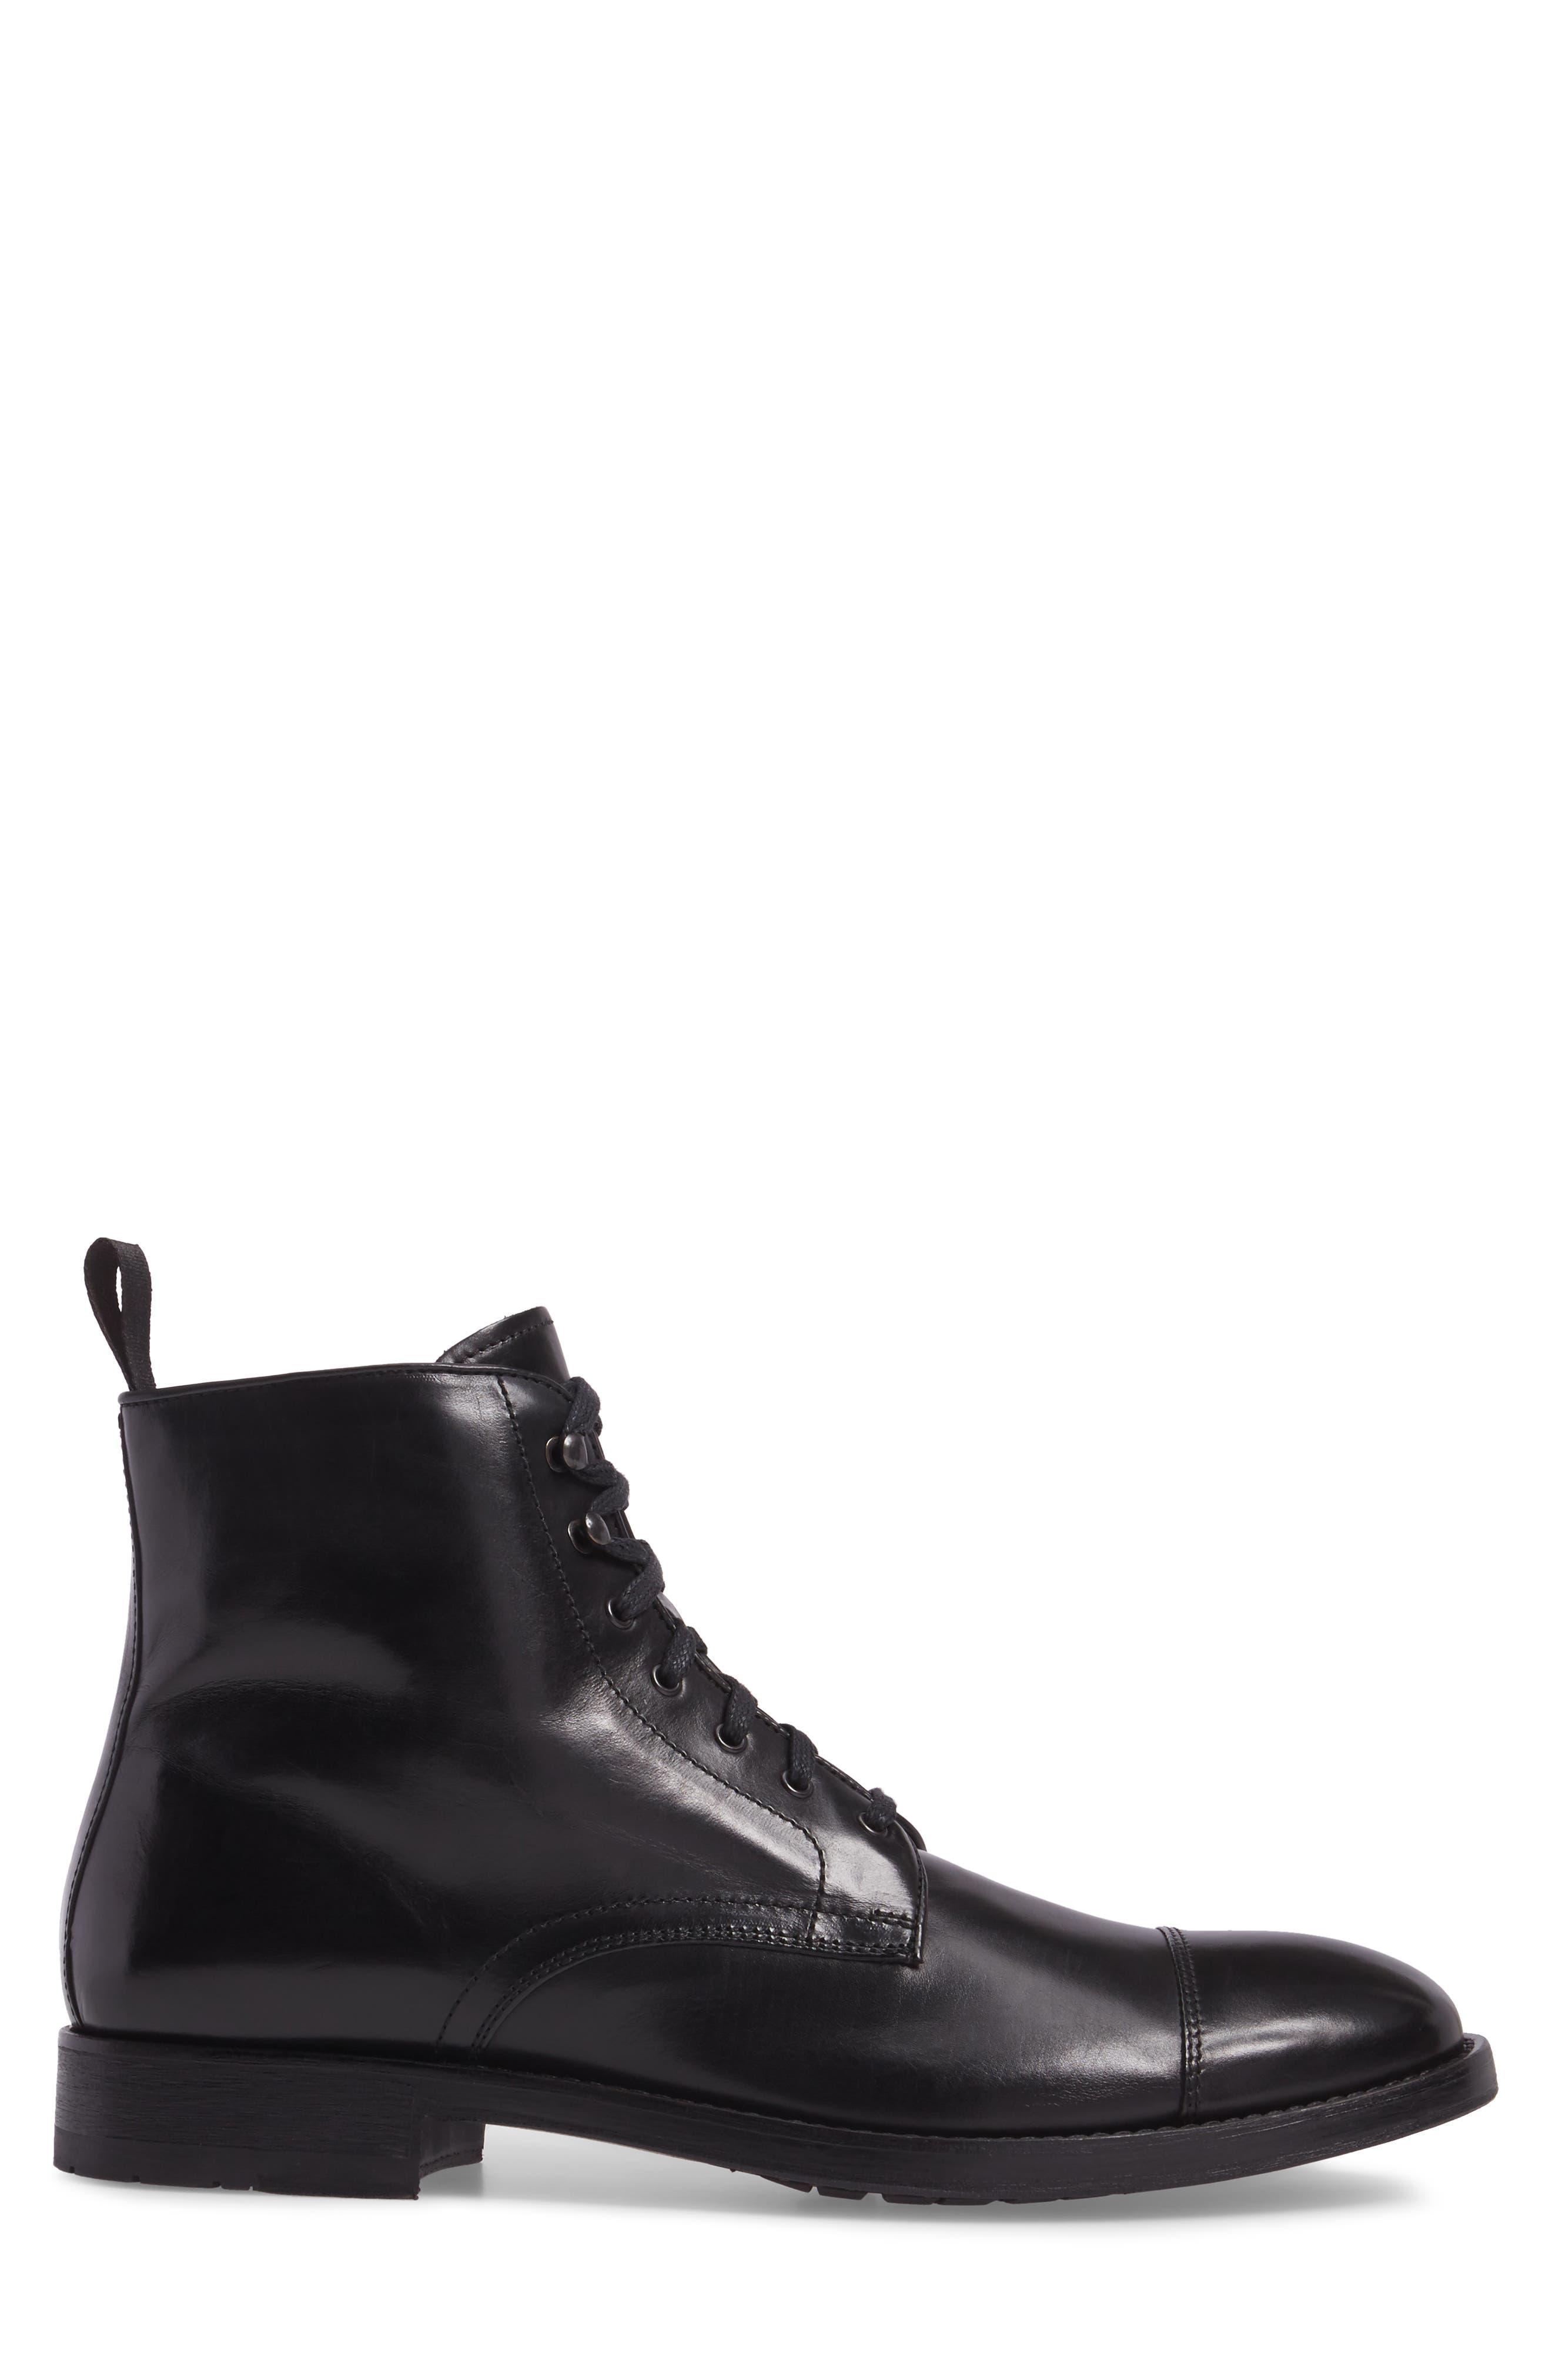 Bondfield Cap Toe Boot,                             Alternate thumbnail 3, color,                             Black